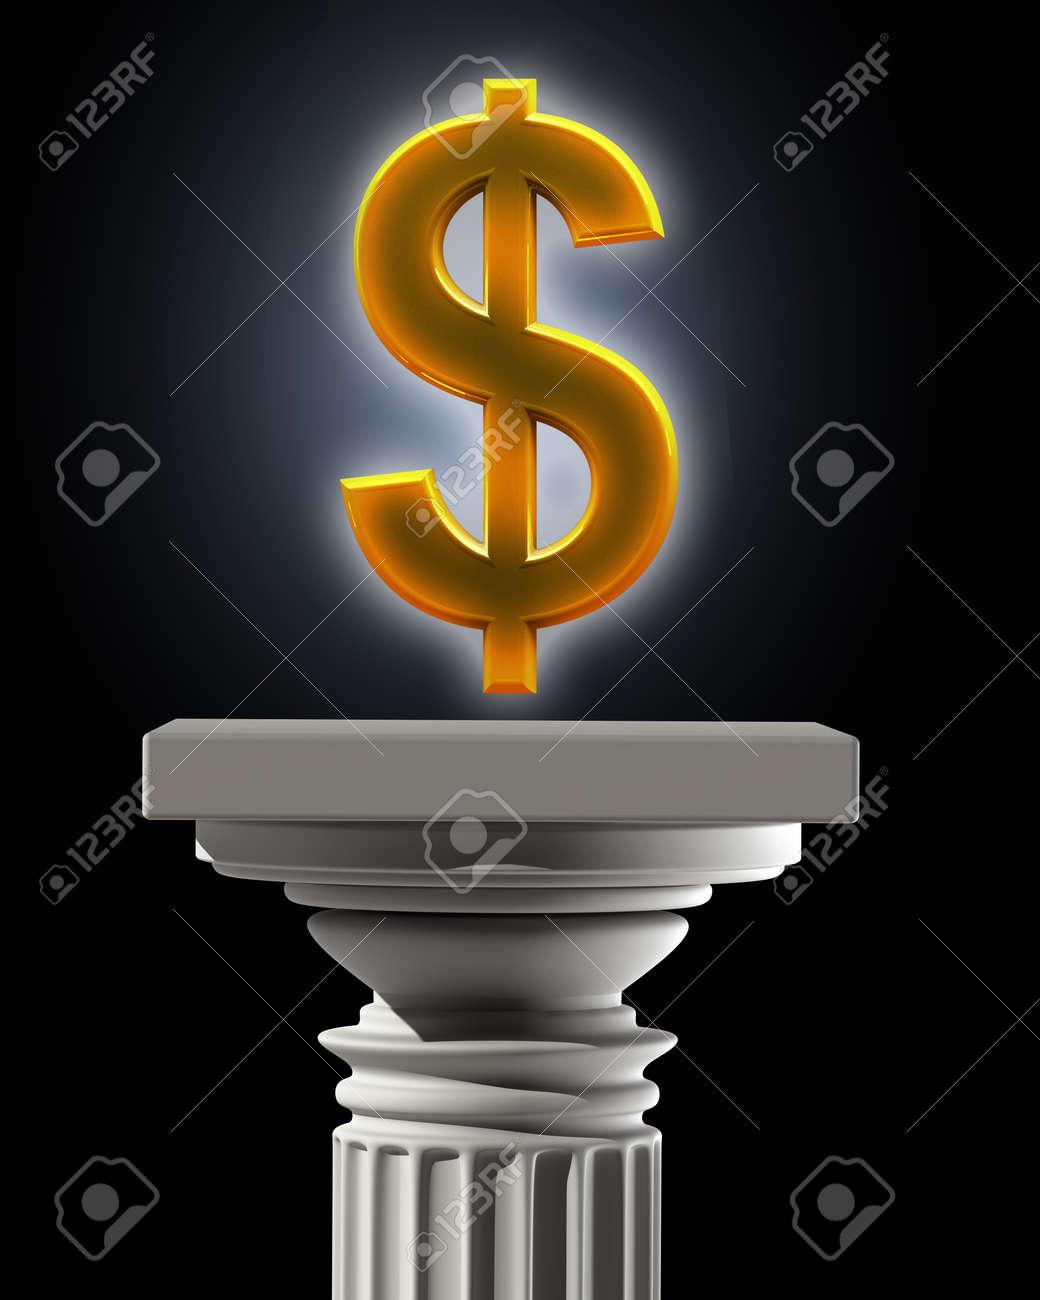 Column Pedestal With Us Dollar Symbol High Resolution 3d Stock Photo